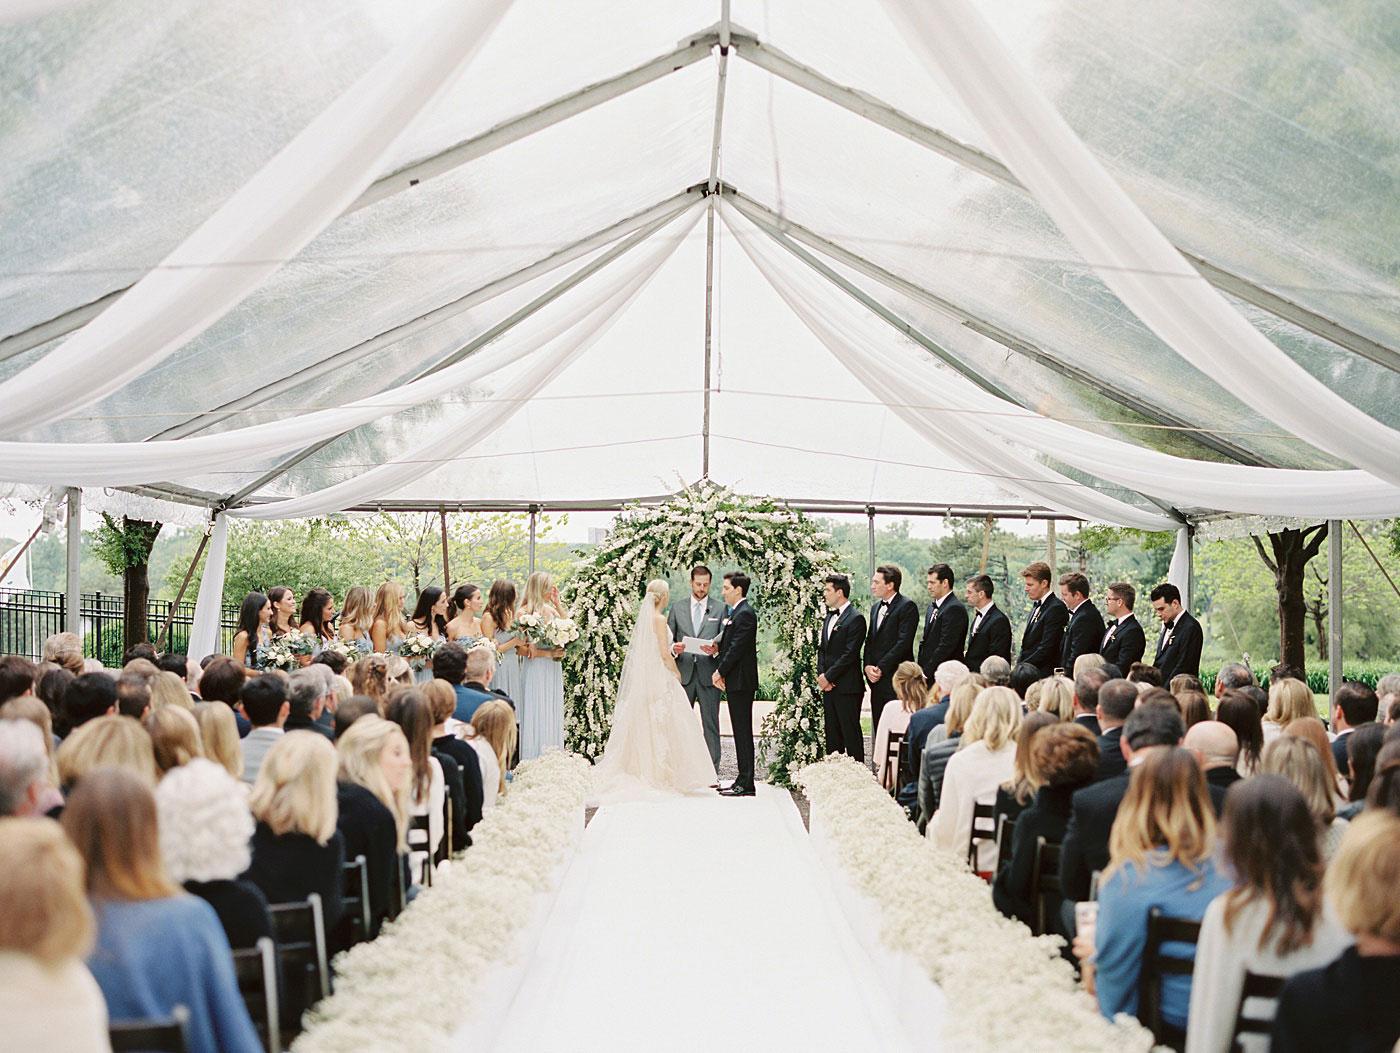 outdoor wedding at world's fair pavilion